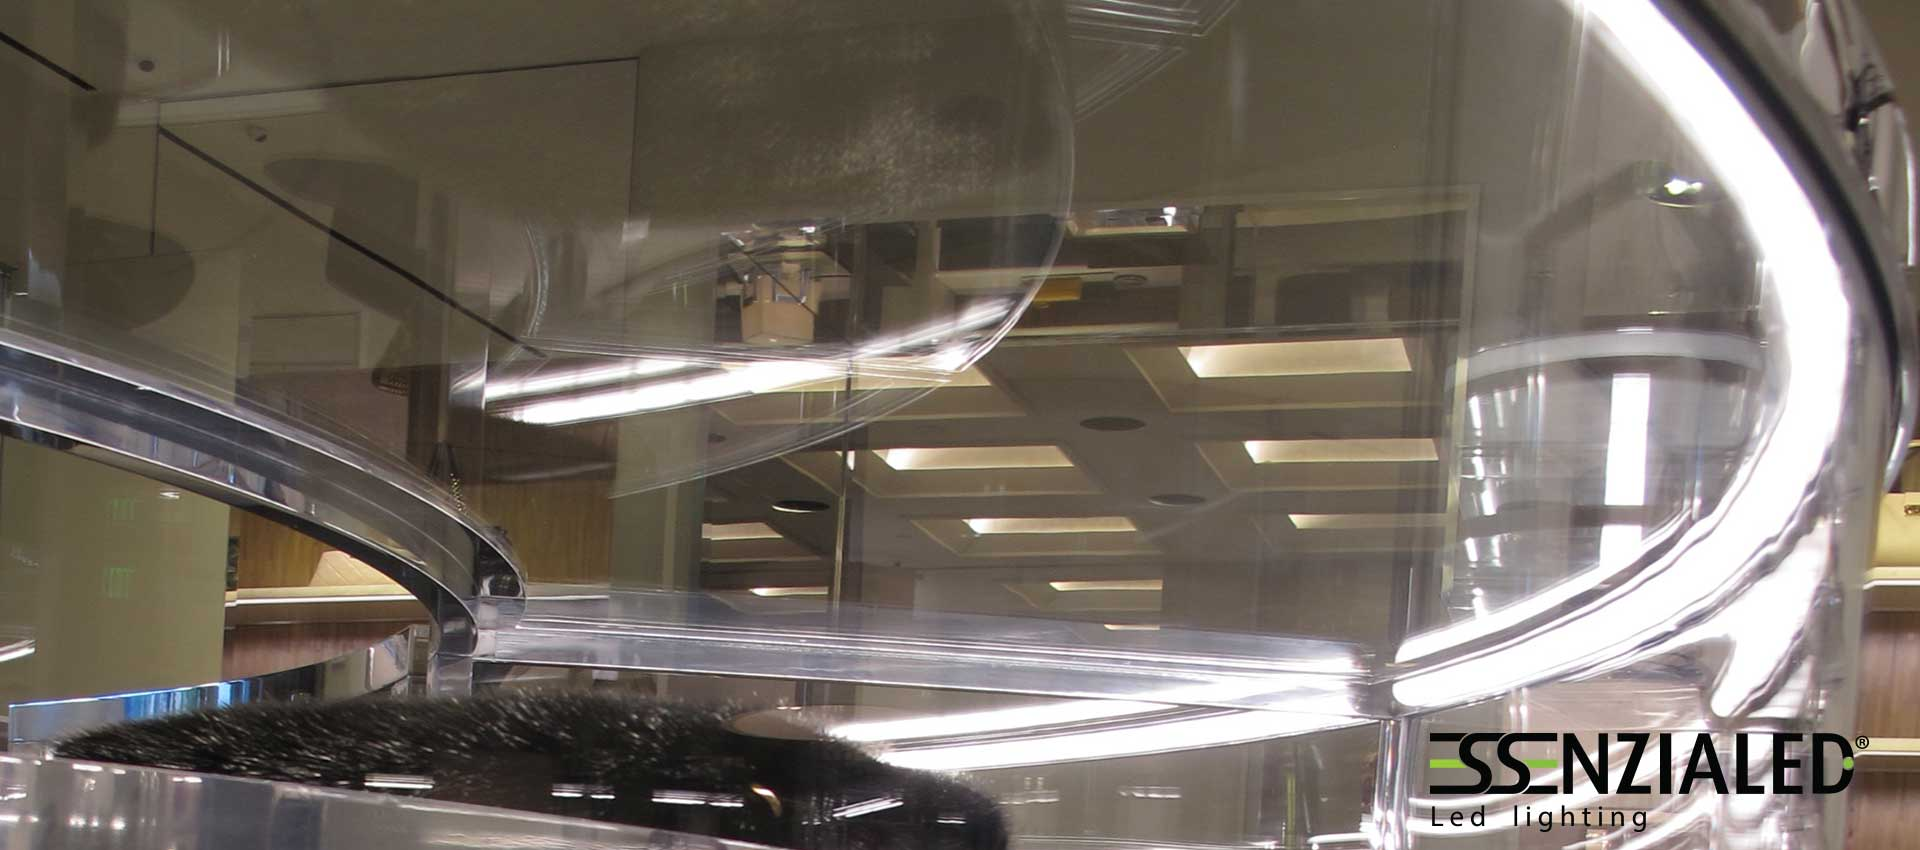 Illuminazione led per negozi made in italy for Lampade a led lunghe